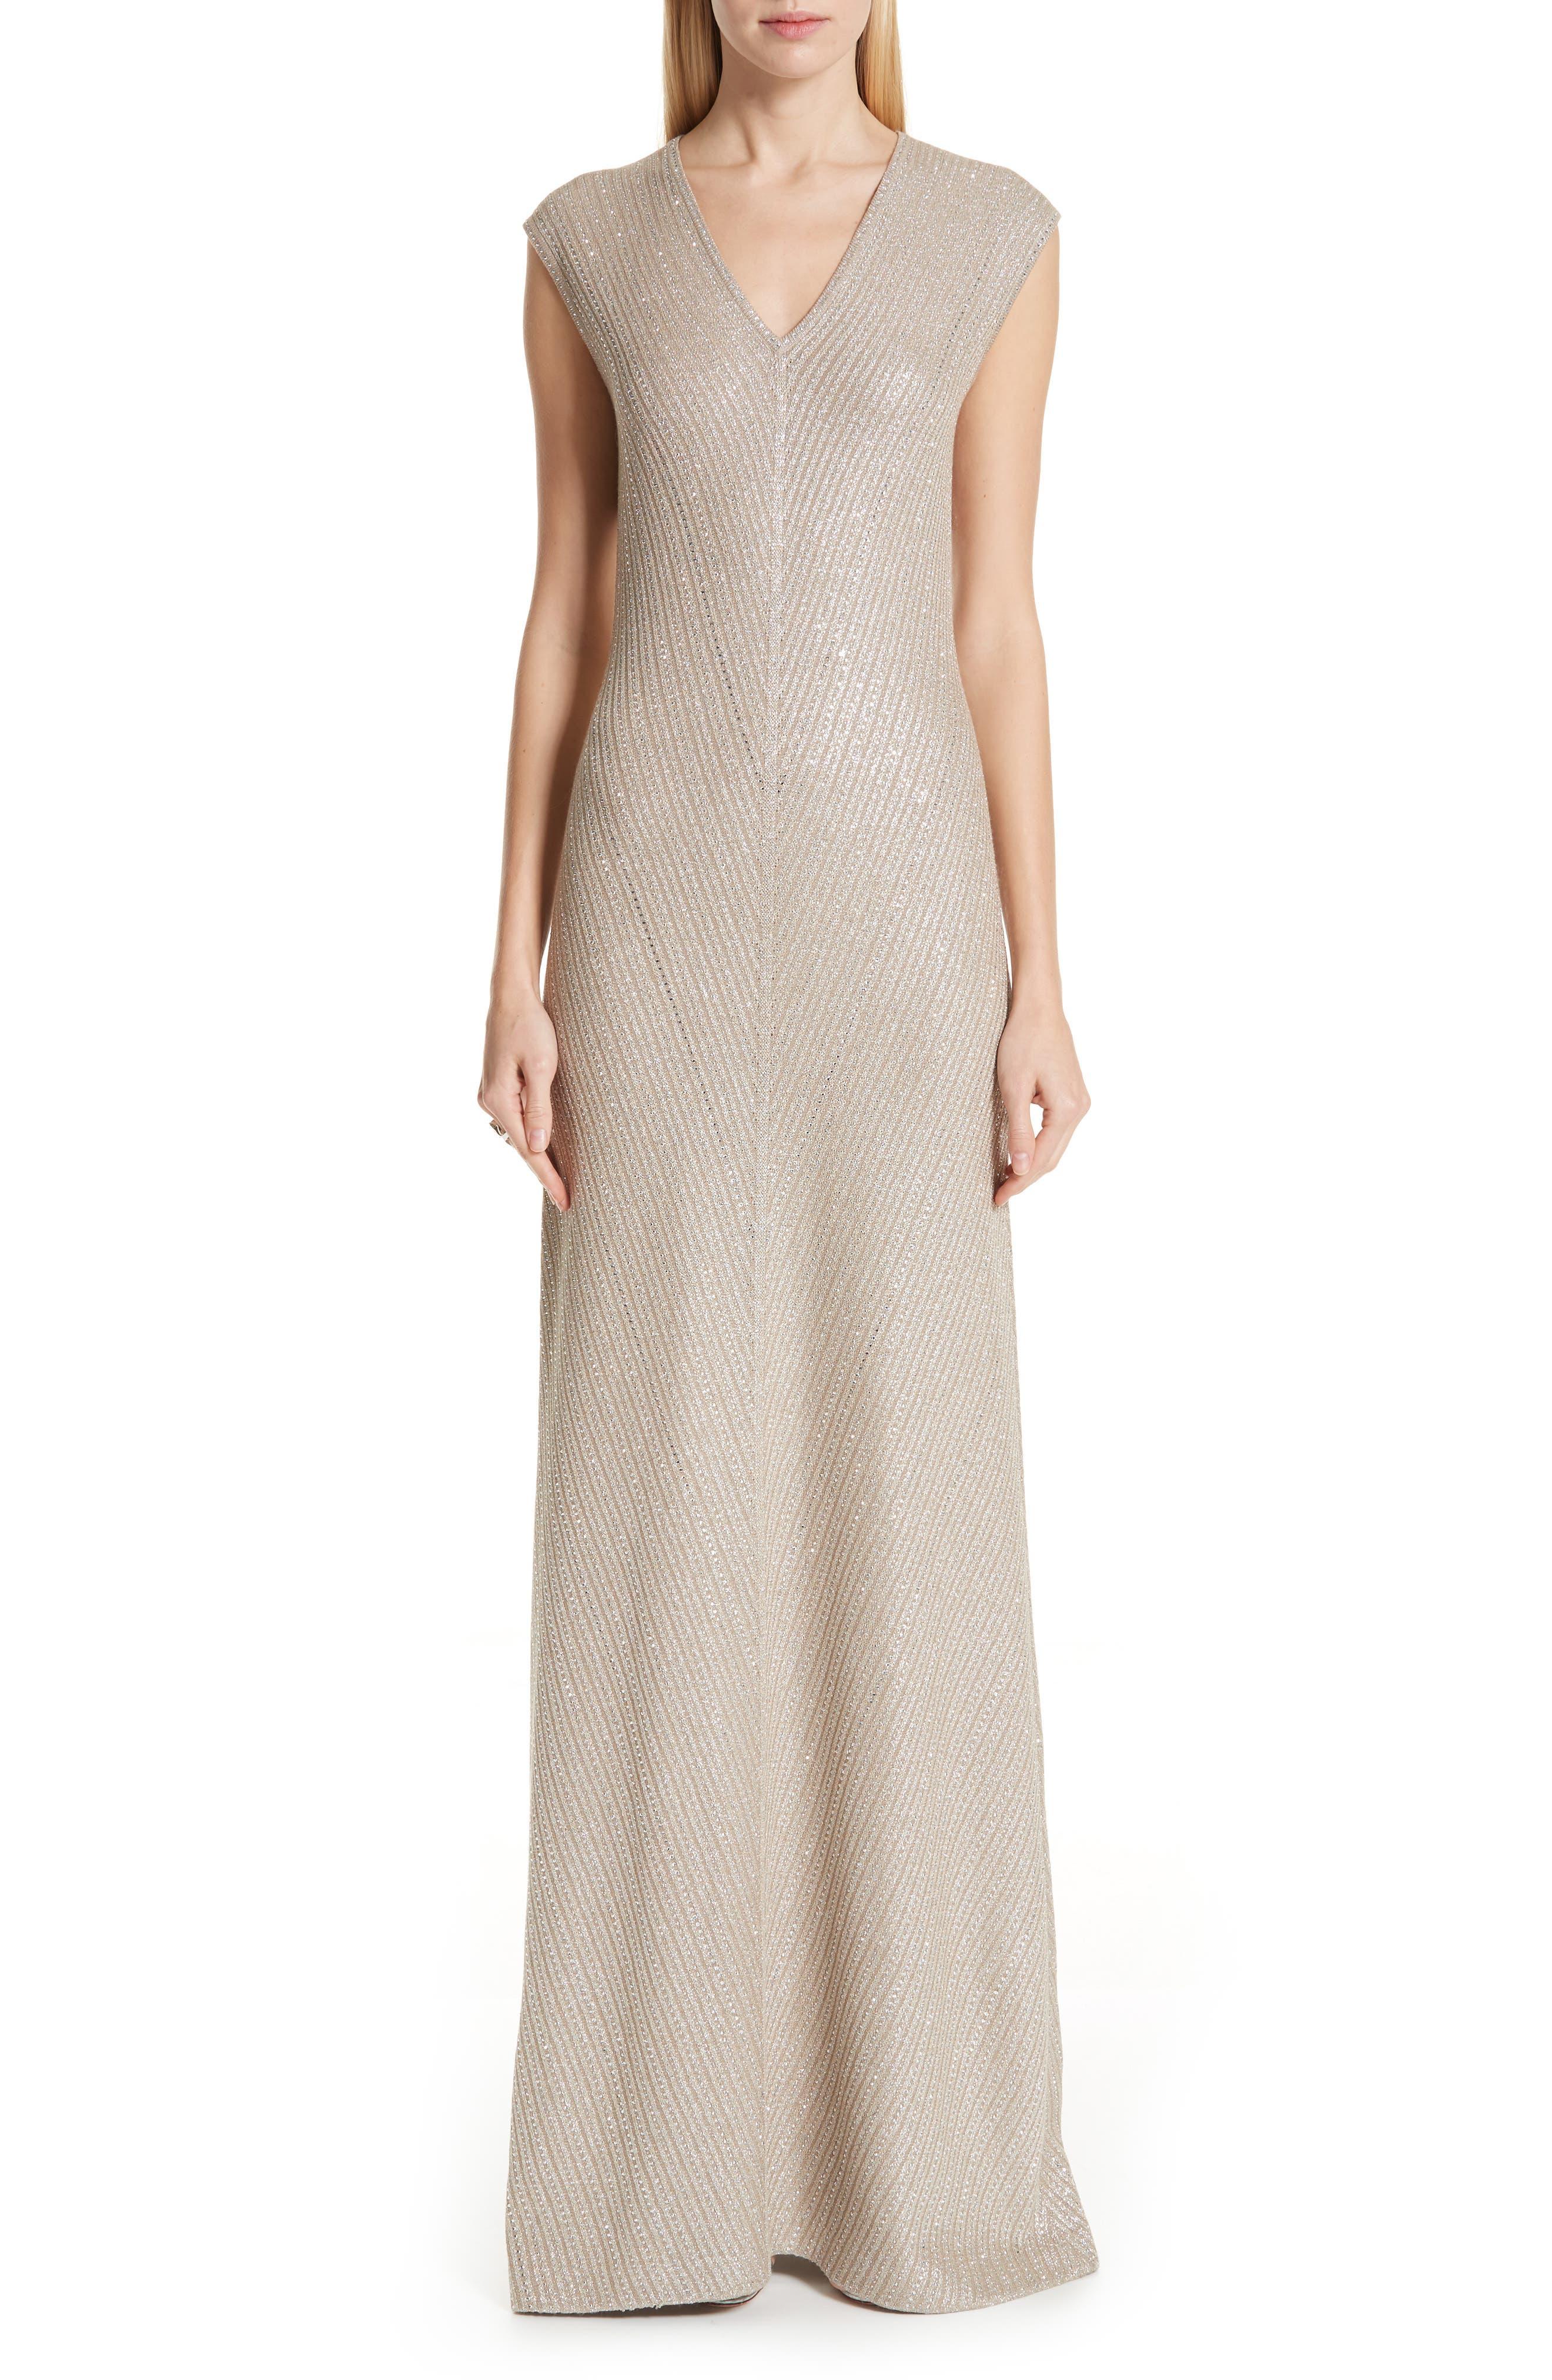 St. John Collection Brielle Knit V-Neck Gown, Beige